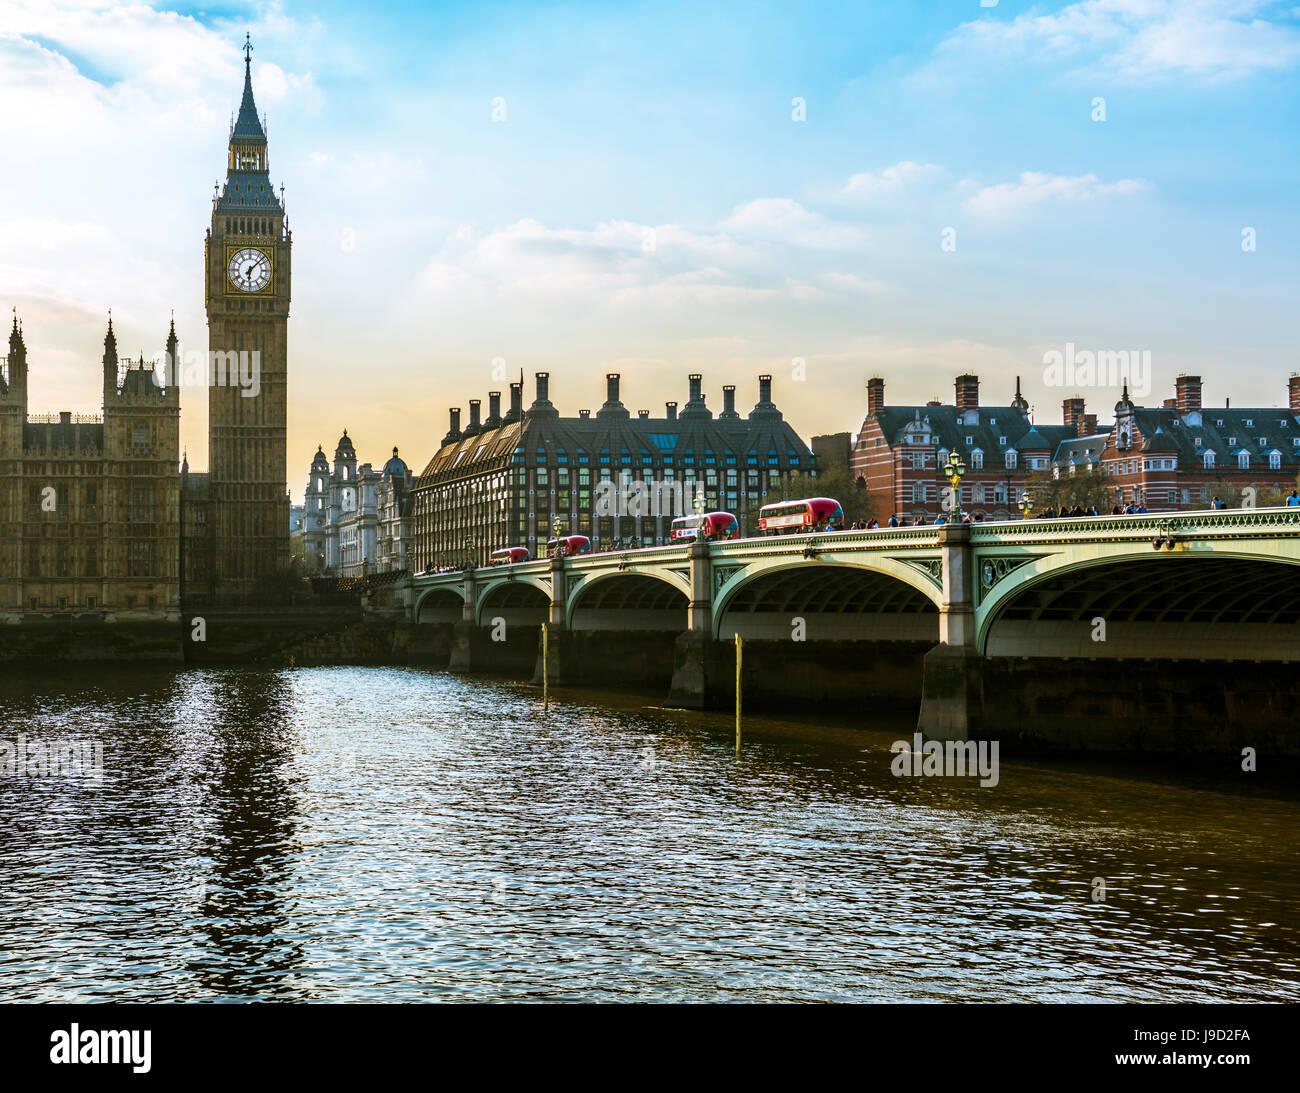 Big Ben, Westminster Bridge, Houses of Parliament, River Thames, London, England, UK - Stock Image